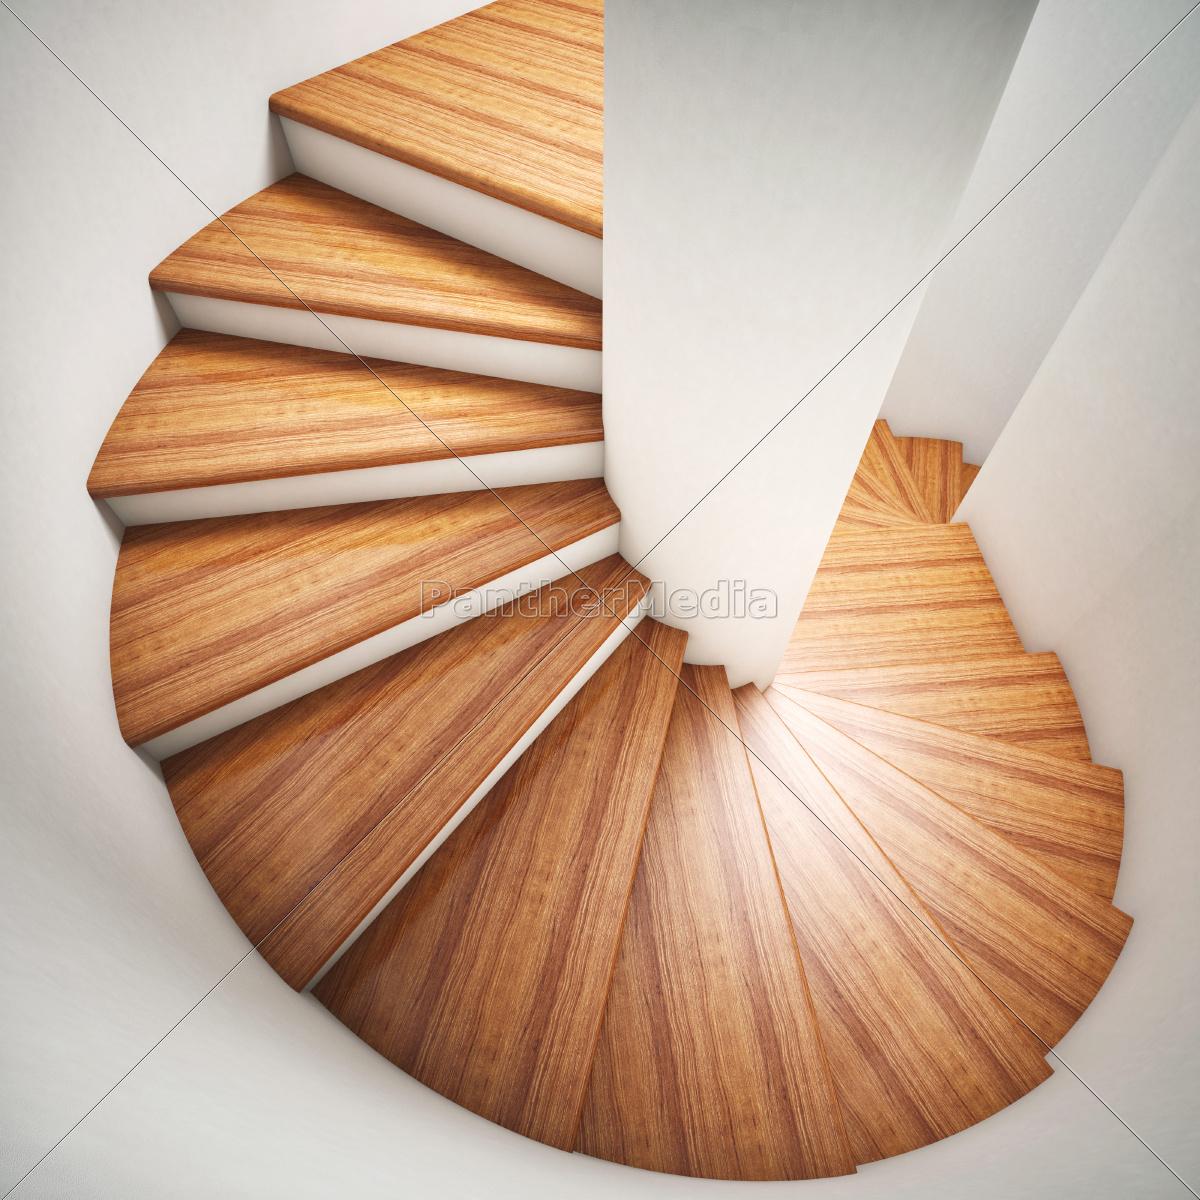 house, building, modern, modernity, wood, interior - 10233755